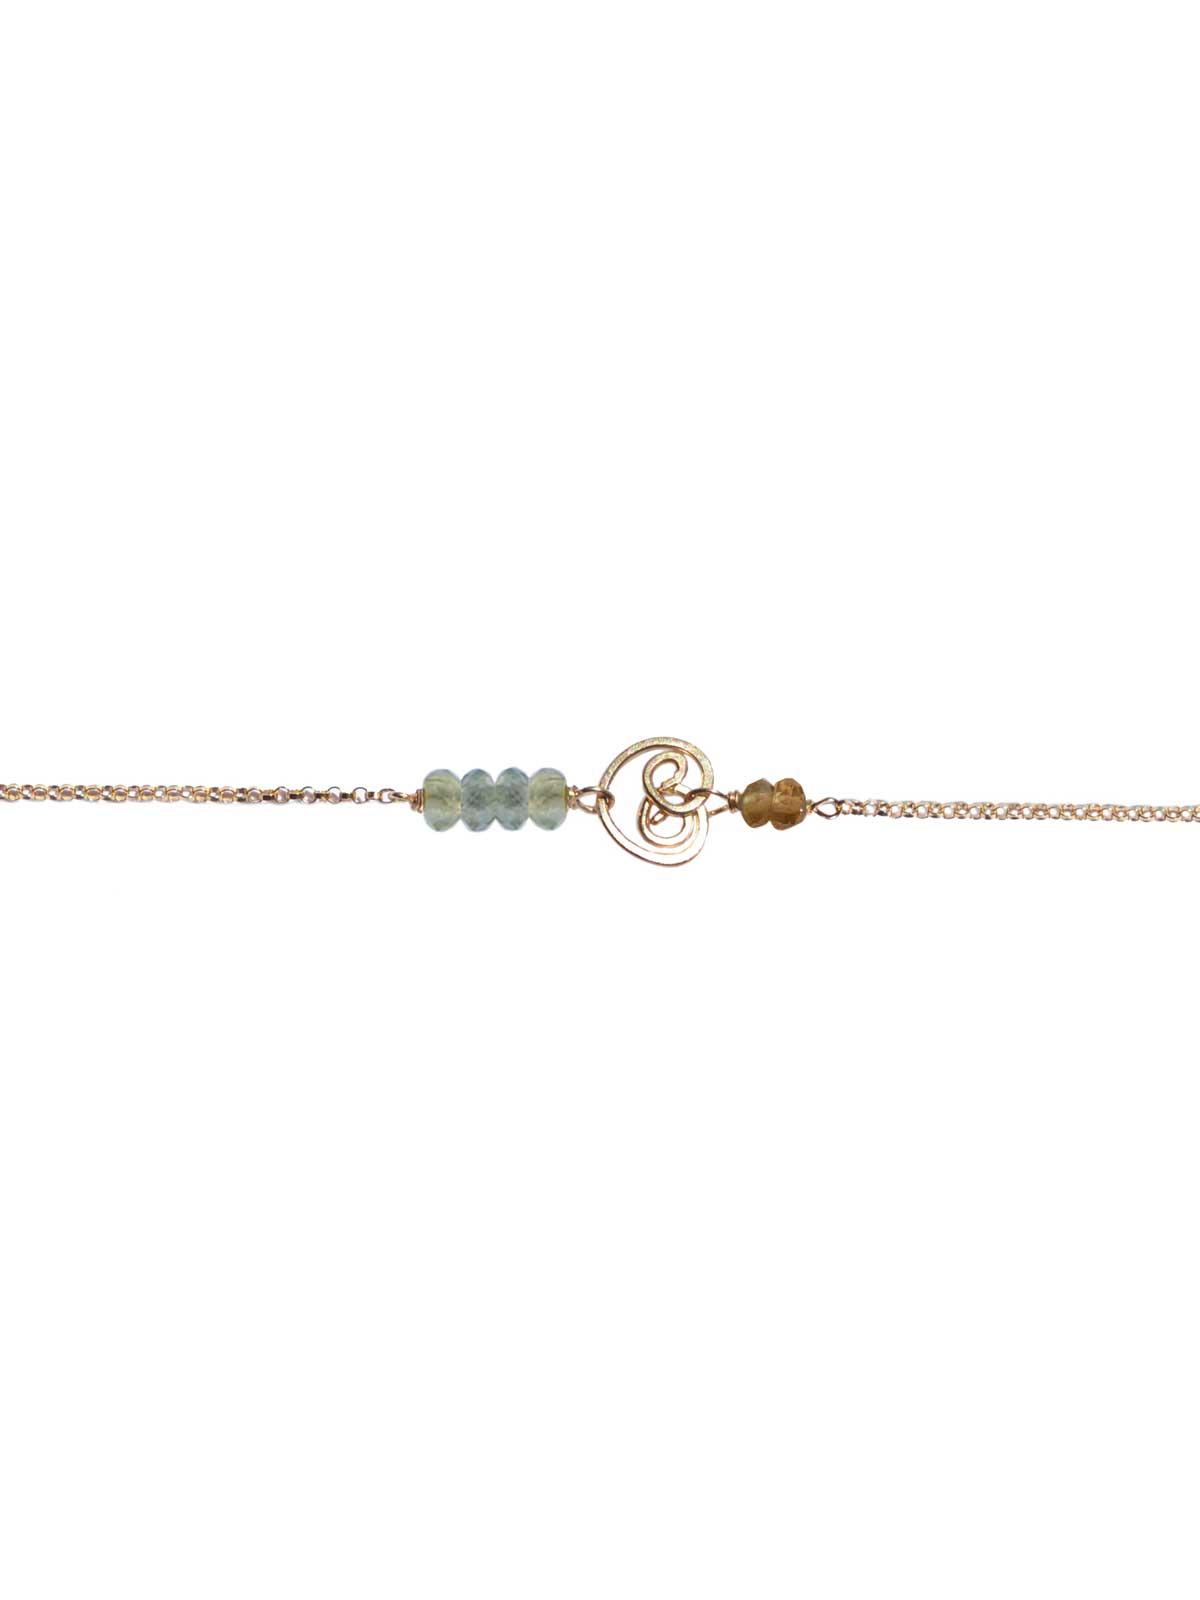 Bracelet Gold Prehnite Tourmaline